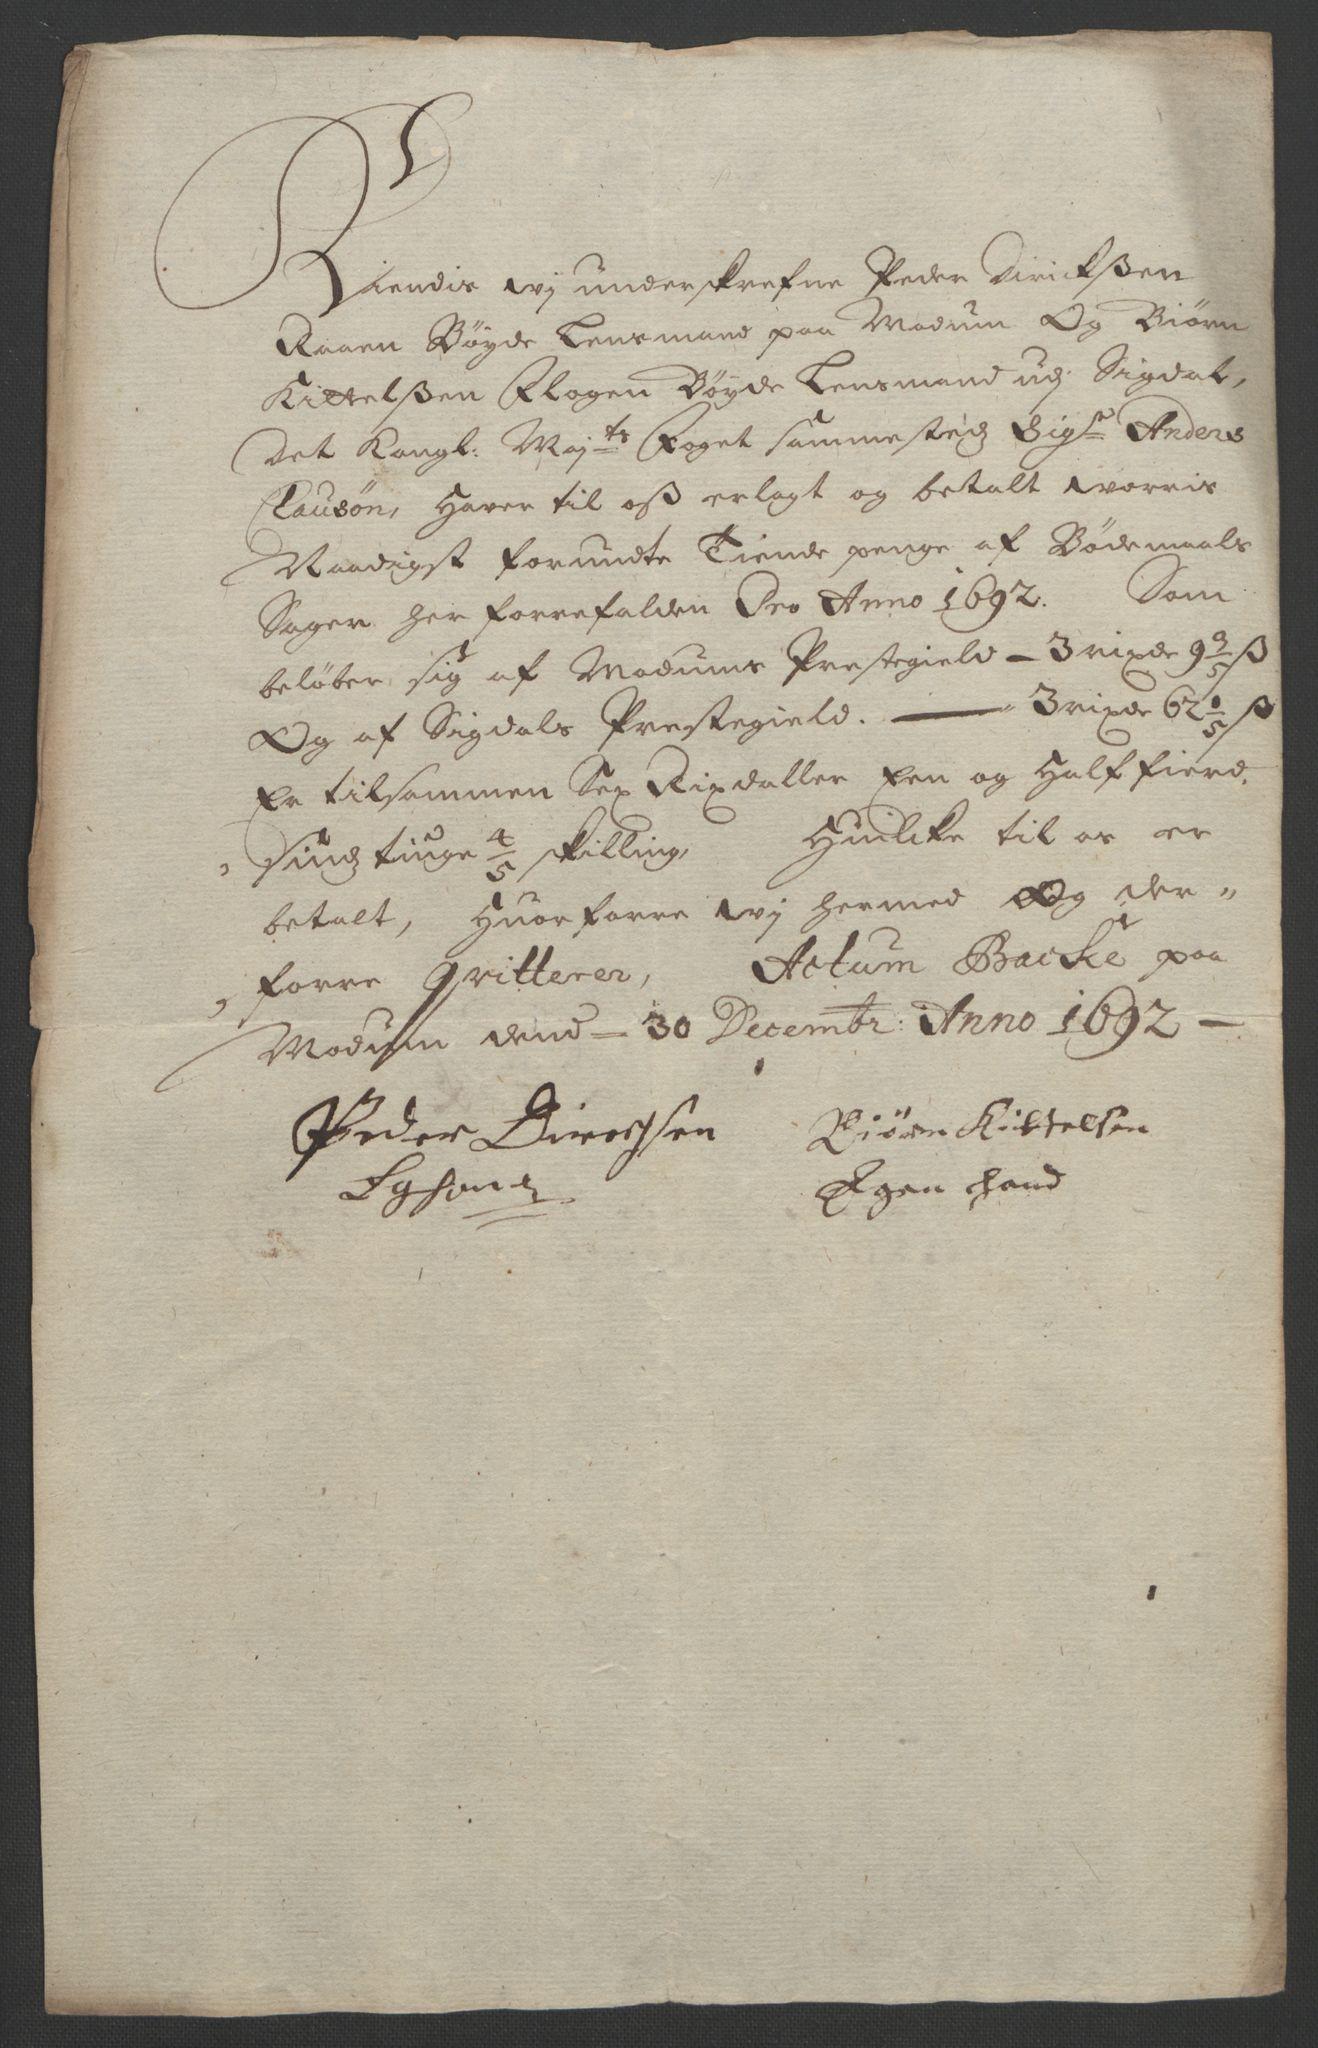 RA, Rentekammeret inntil 1814, Reviderte regnskaper, Fogderegnskap, R25/L1681: Fogderegnskap Buskerud, 1691-1692, s. 493